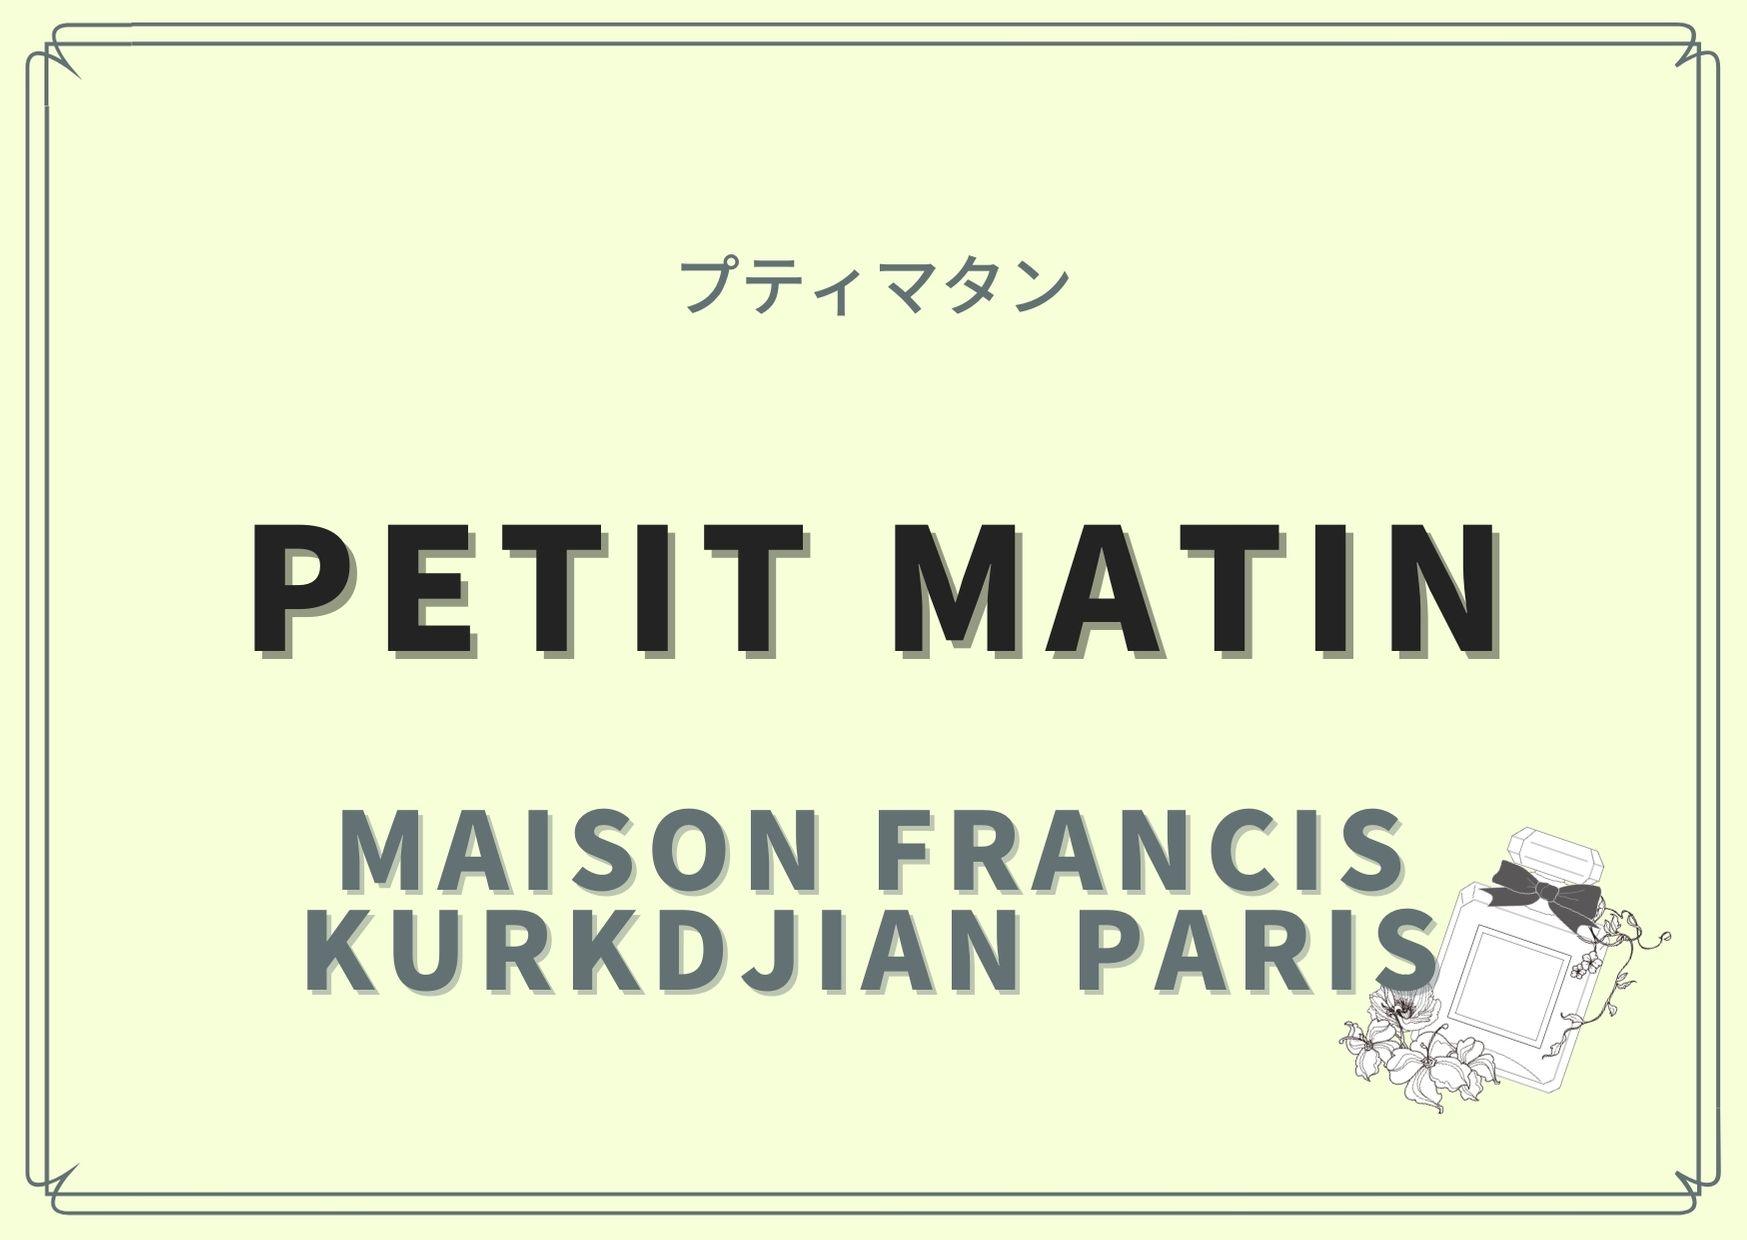 PETIT MATIN(プティマタン) / Maison Francis Kurkdjian Paris(メゾン フランシス クルジャン)